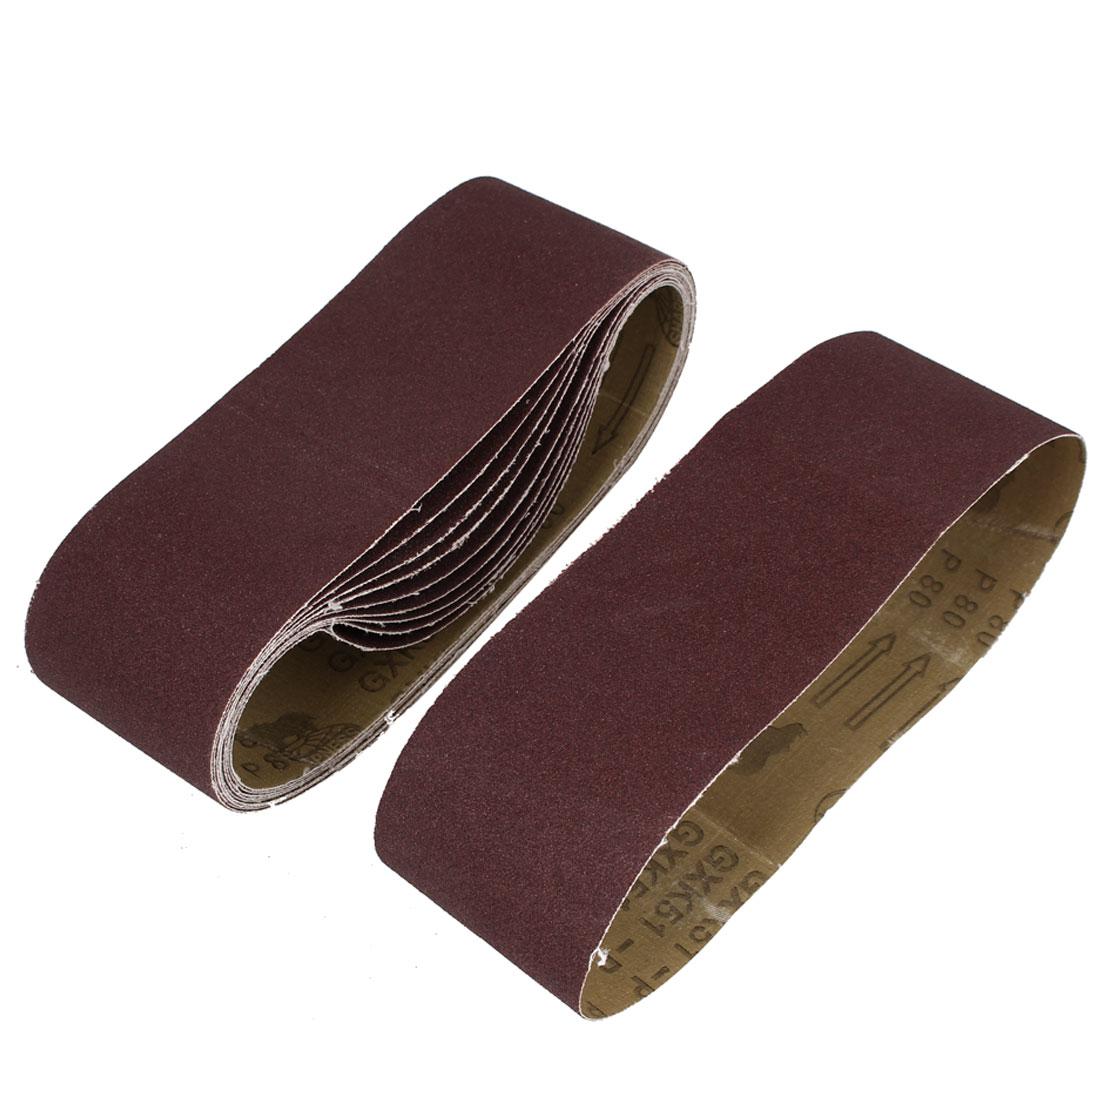 Woodworking 533mmx75mm 80 Grit Abrasive Sanding Belt Sandpaper 10pcs